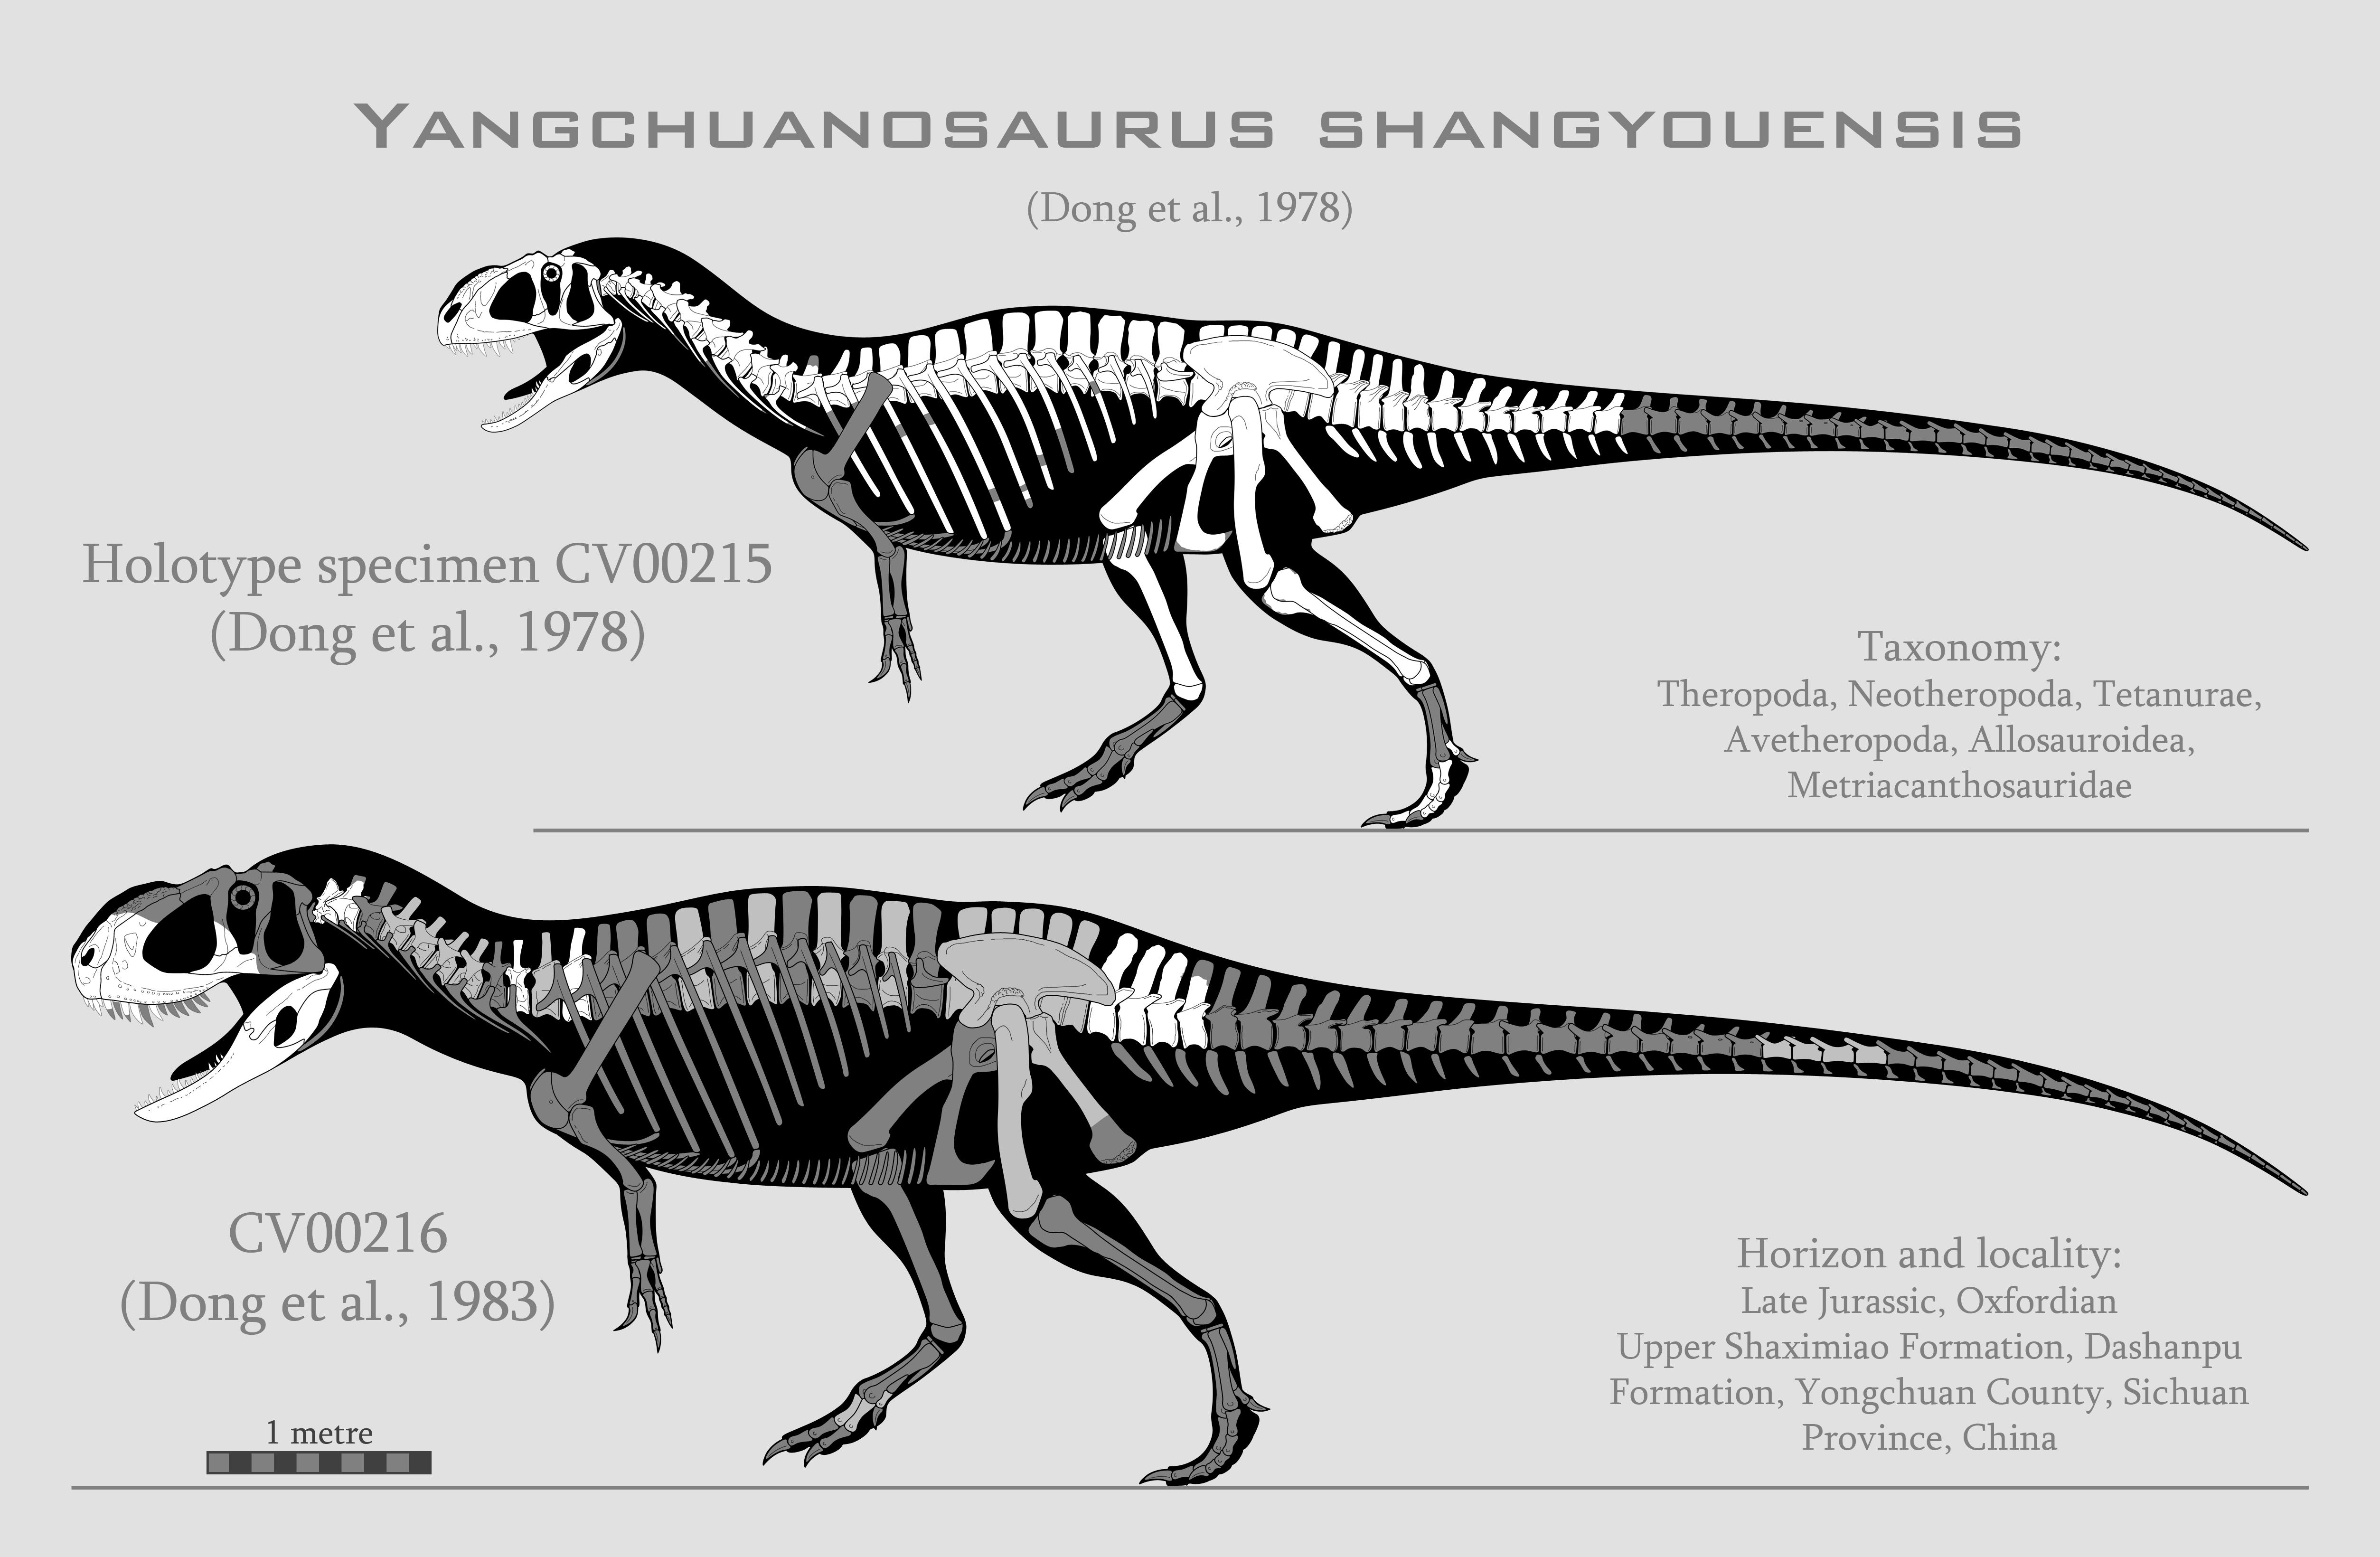 Yangchuanosaurus shangyouensis skeletals by ...